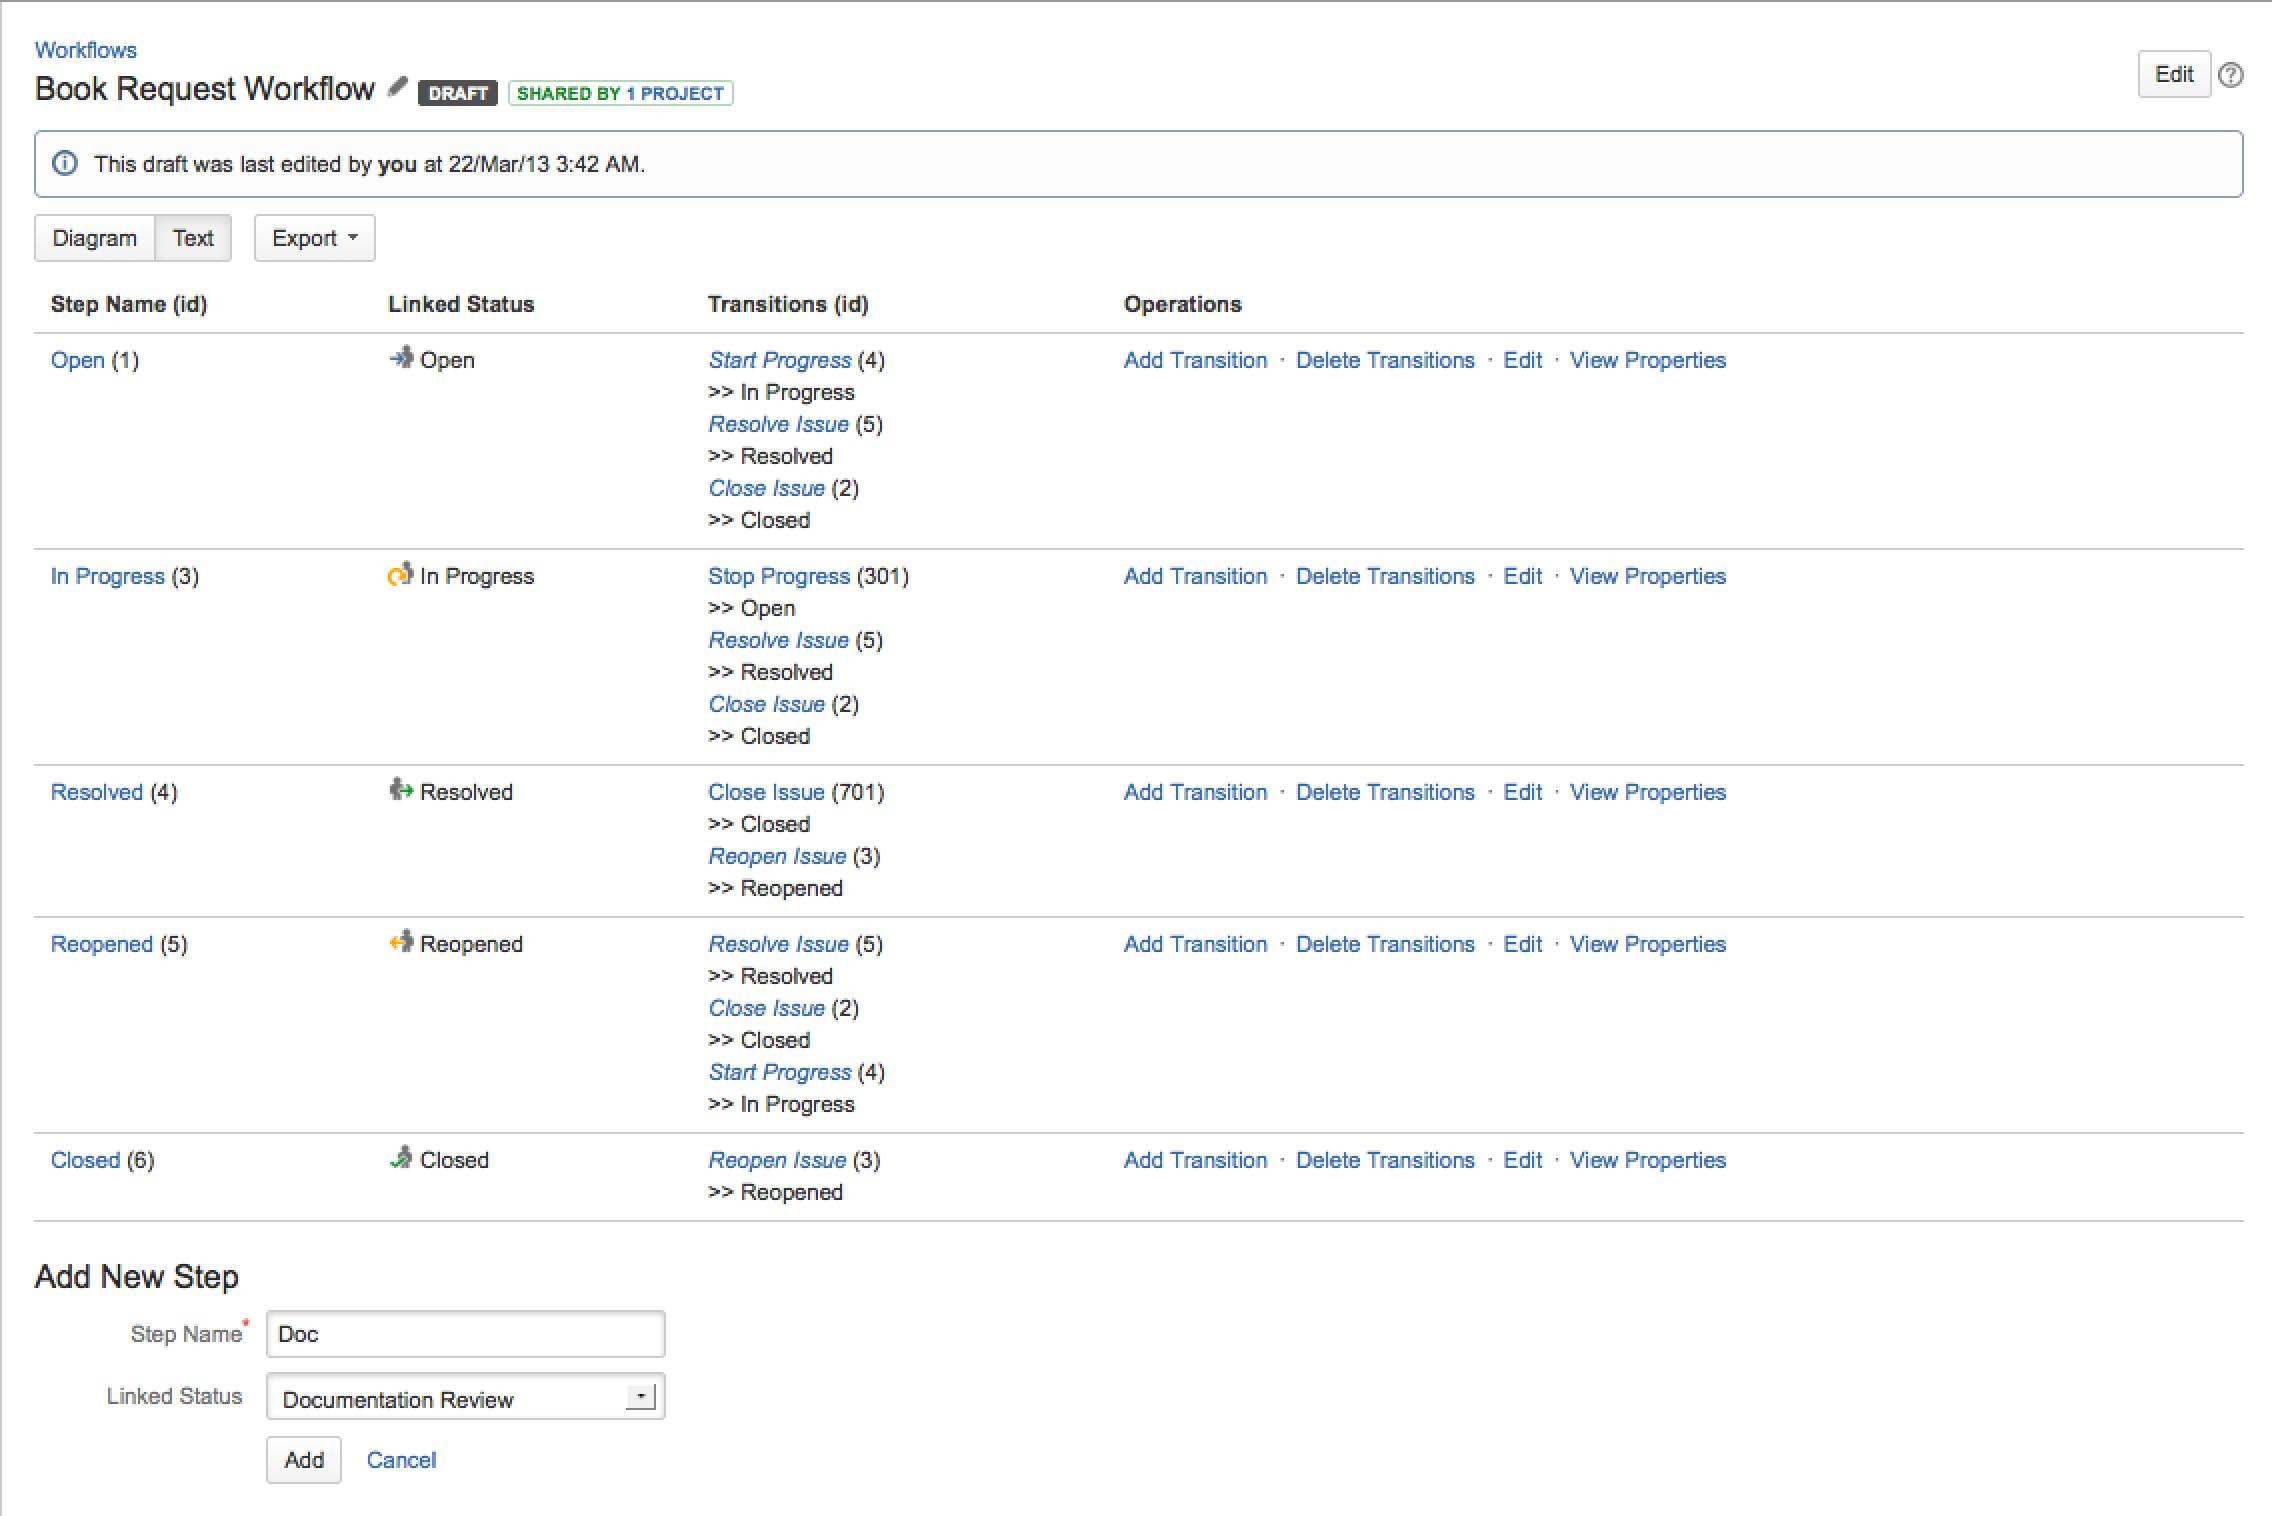 configuring workflow atlassian documentation